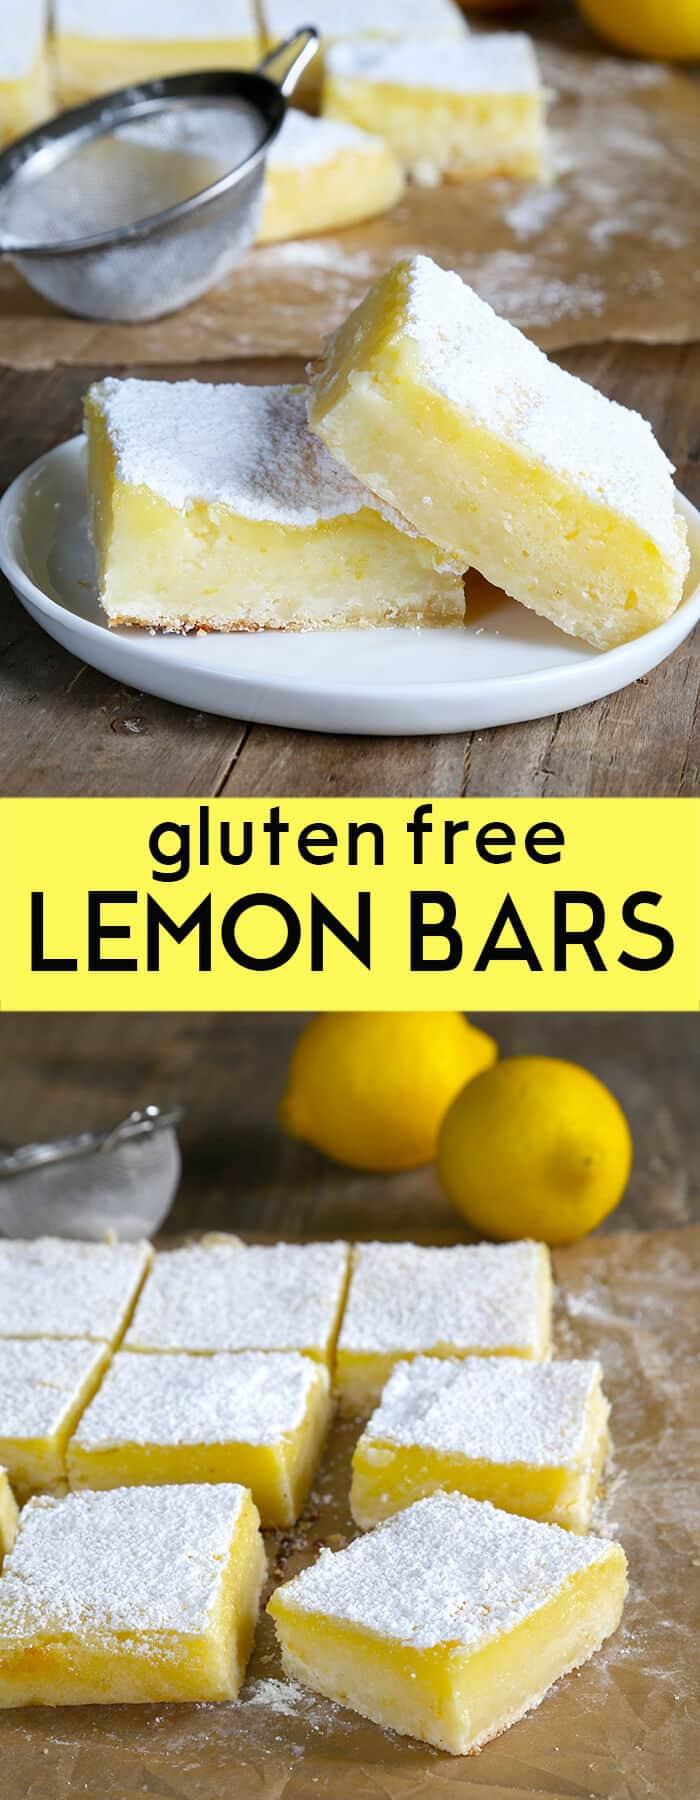 Two lemon bars on a small plate